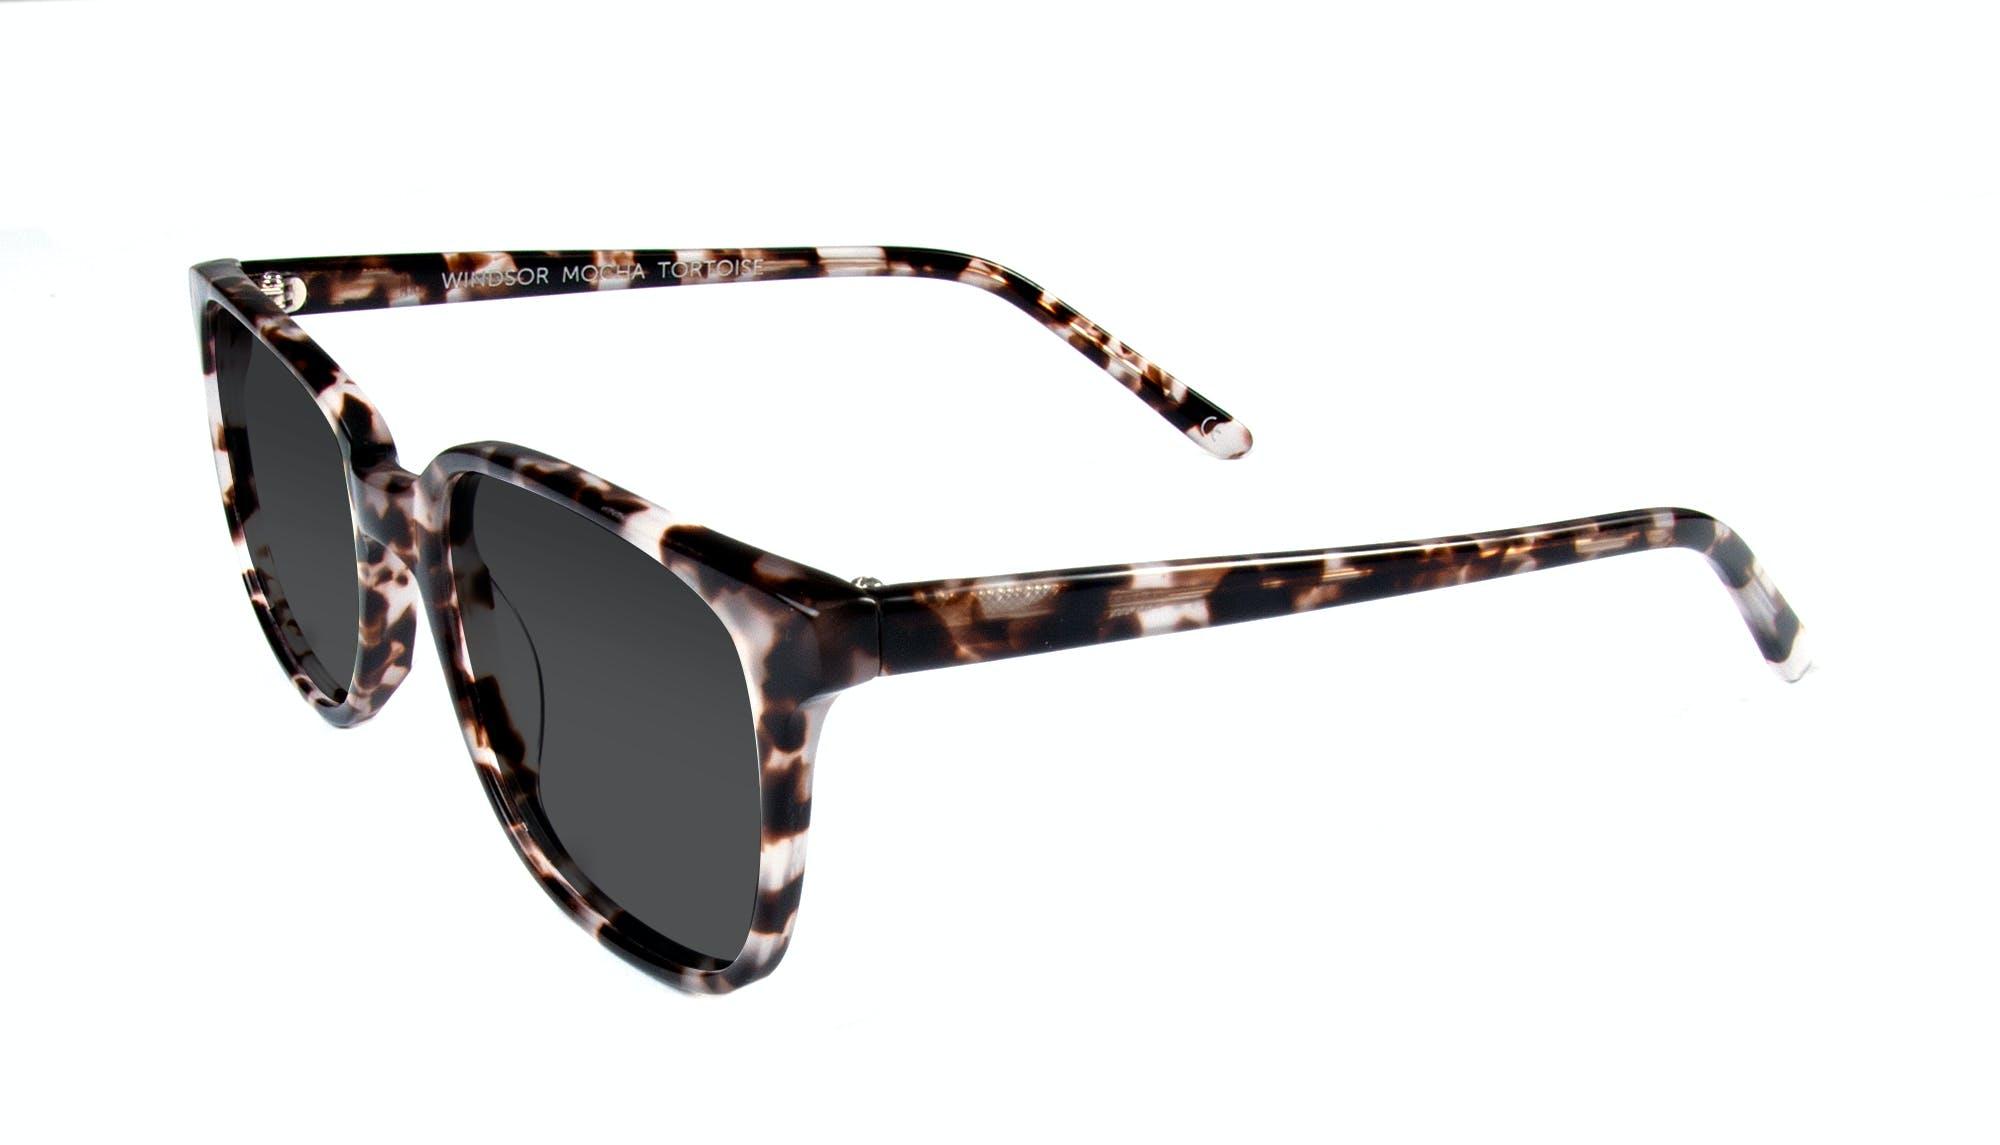 Affordable Fashion Glasses Rectangle Square Sunglasses Women Windsor Mocha Tortoise Tilt